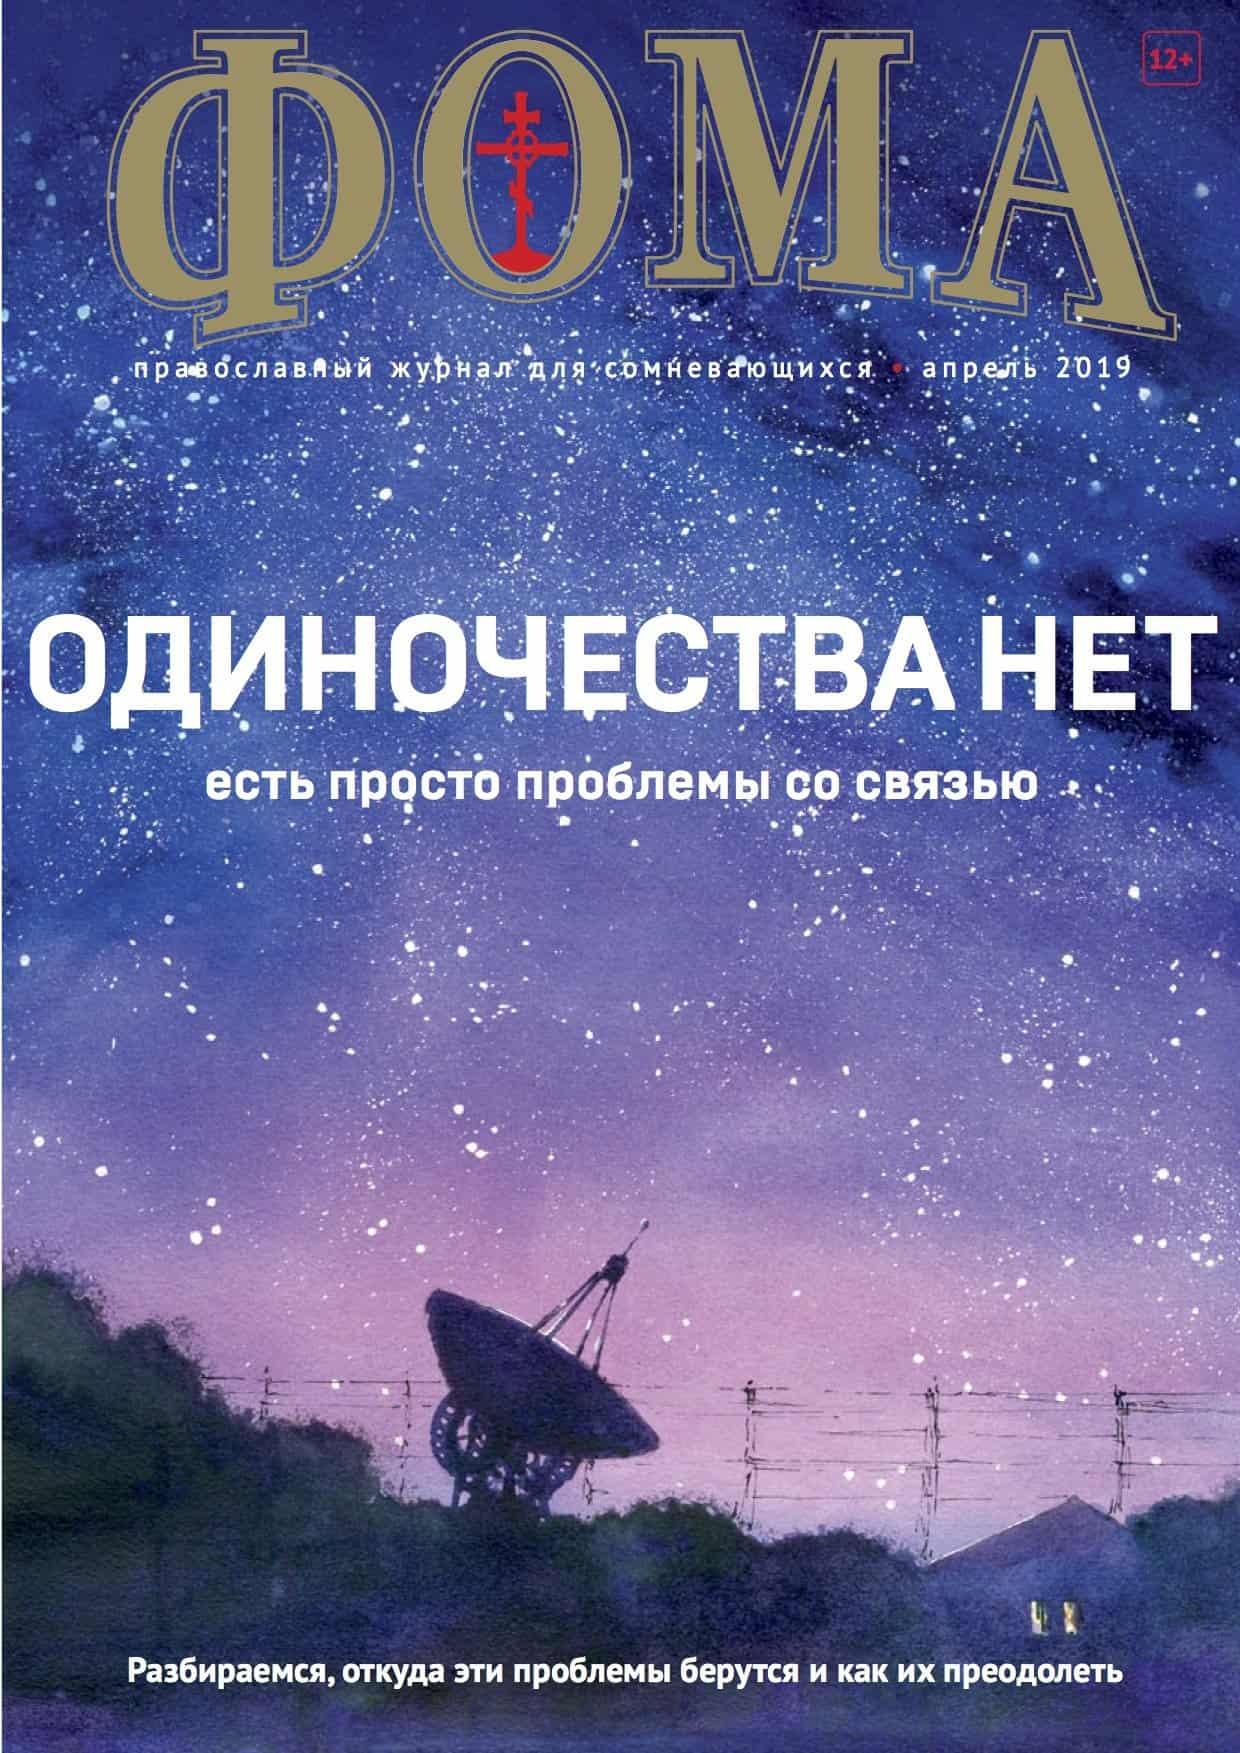 Апрель 2019 (192) №4